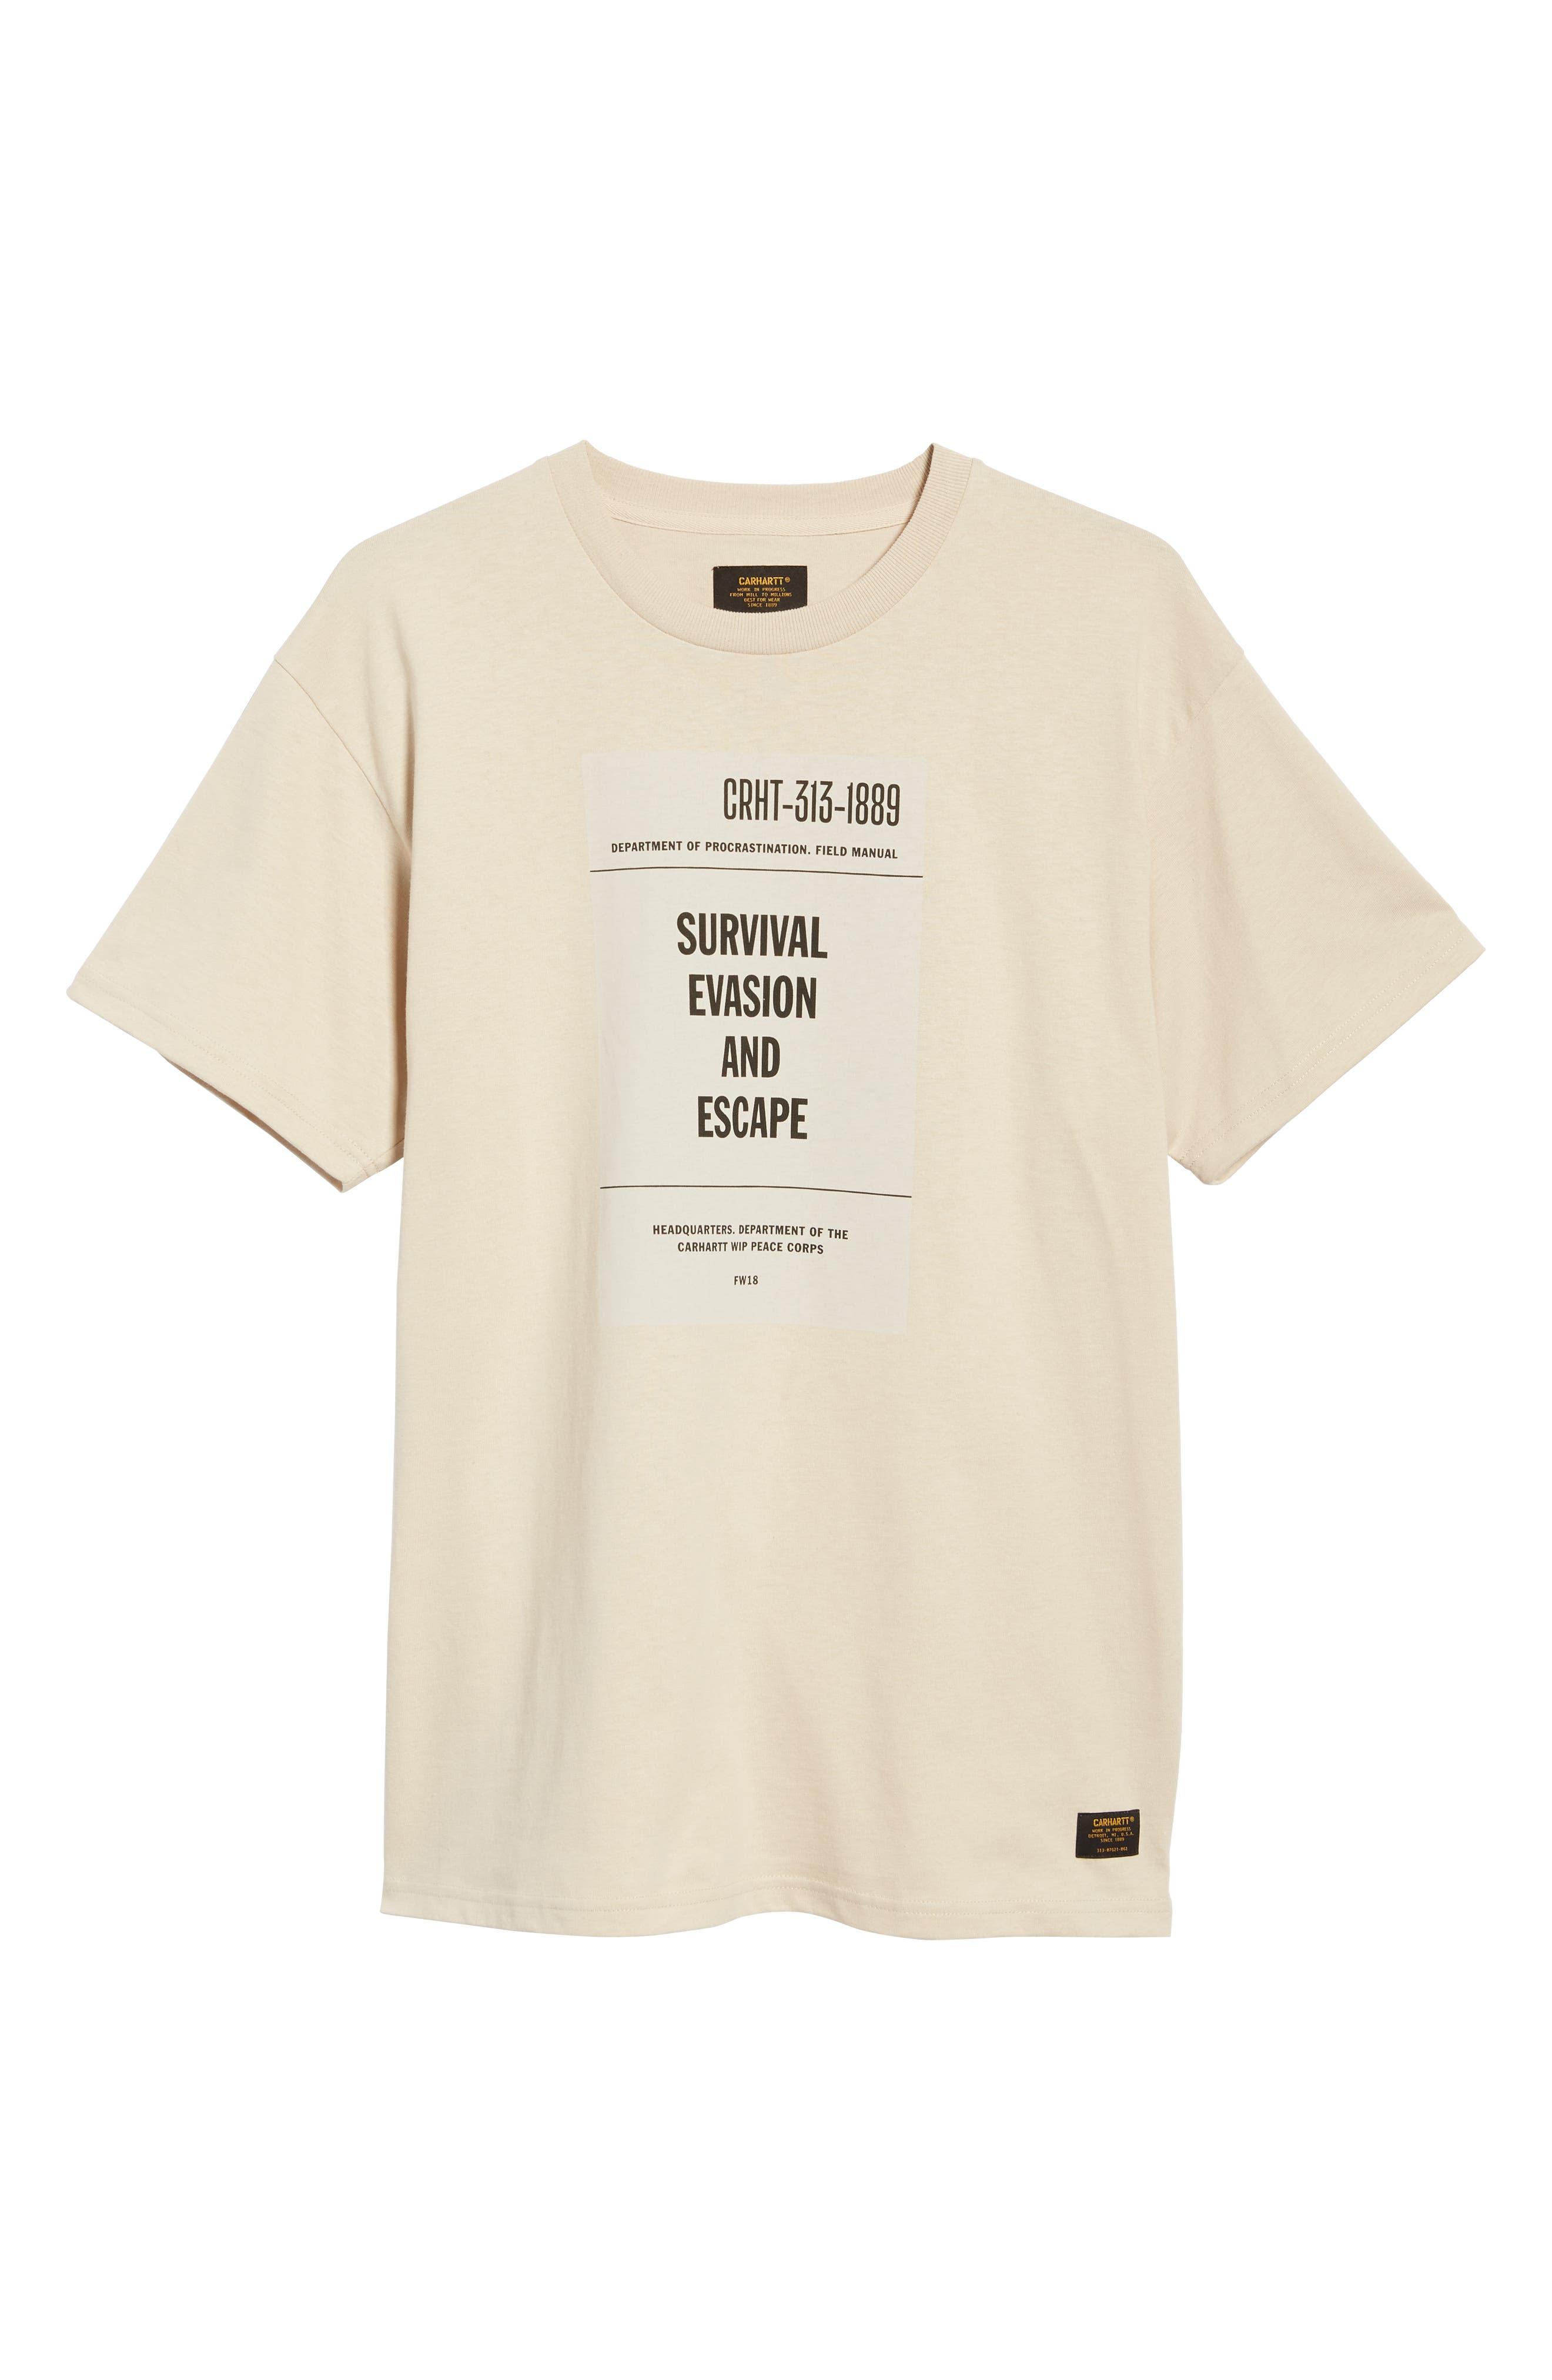 CARHARTT WORK IN PROGRESS,                             Survival Graphic T-Shirt,                             Alternate thumbnail 6, color,                             250